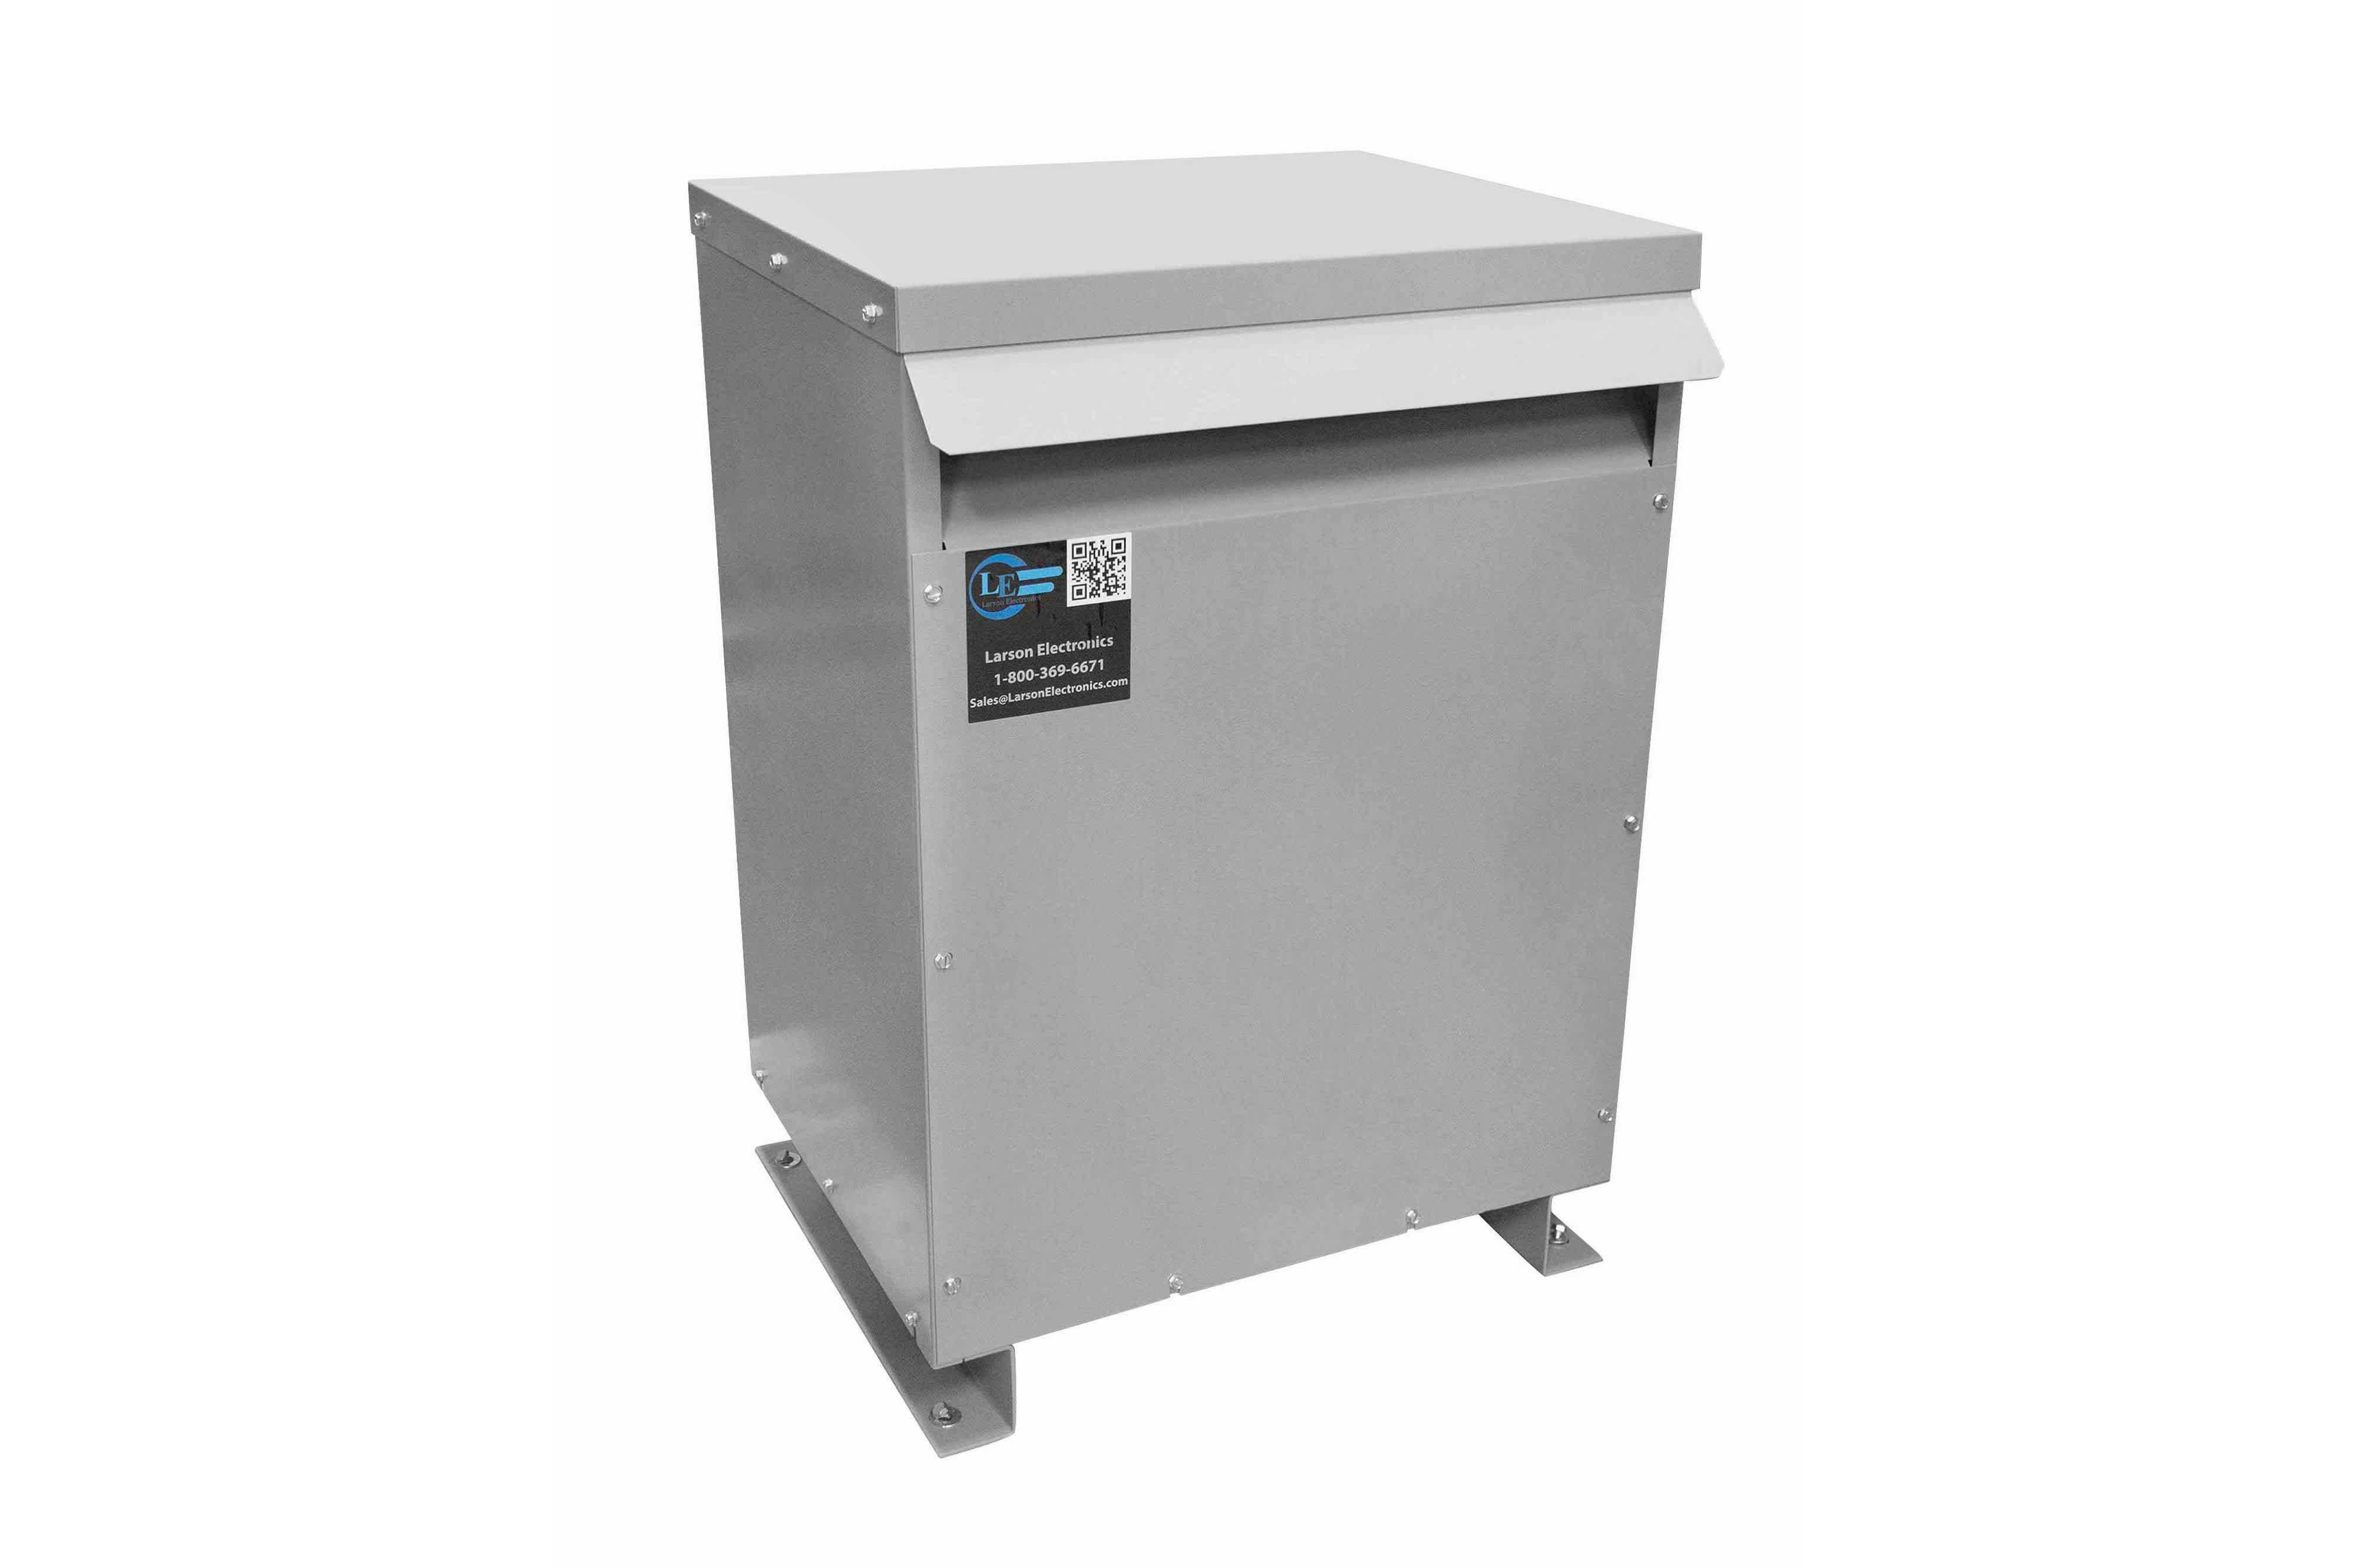 600 kVA 3PH Isolation Transformer, 480V Wye Primary, 208V Delta Secondary, N3R, Ventilated, 60 Hz